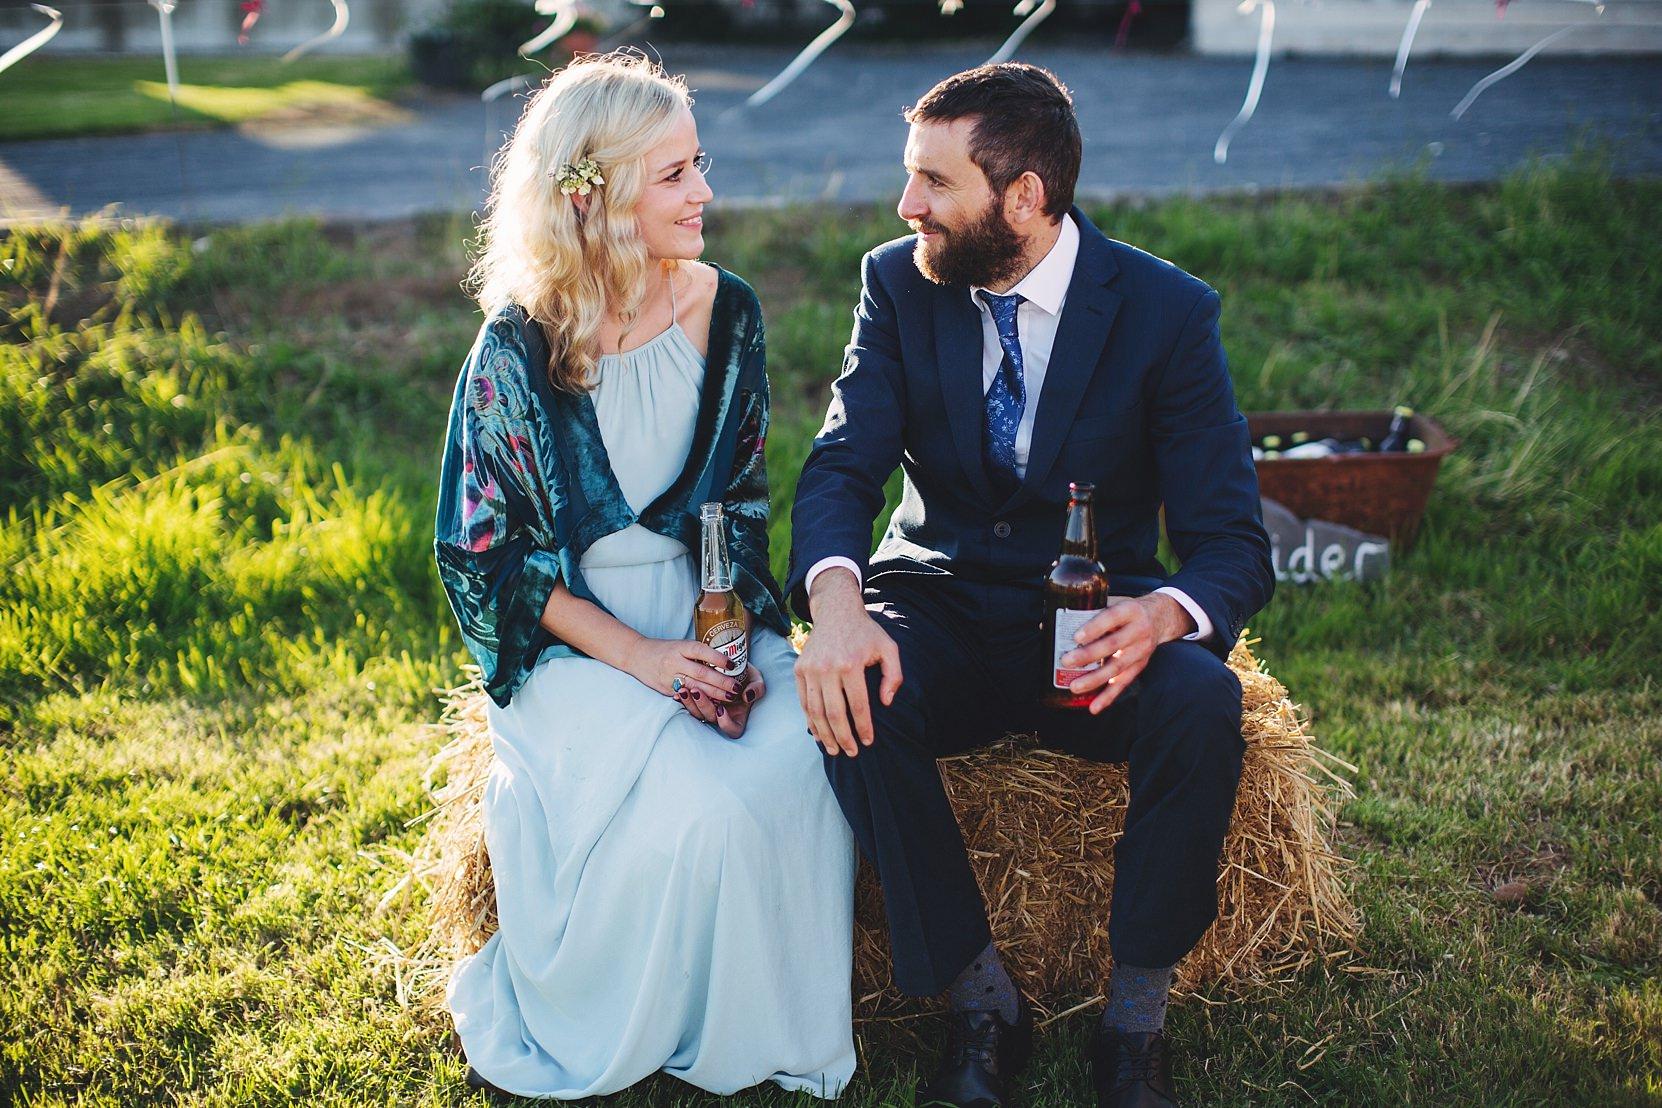 Guests sitting on hay-bales at a DIY wedding